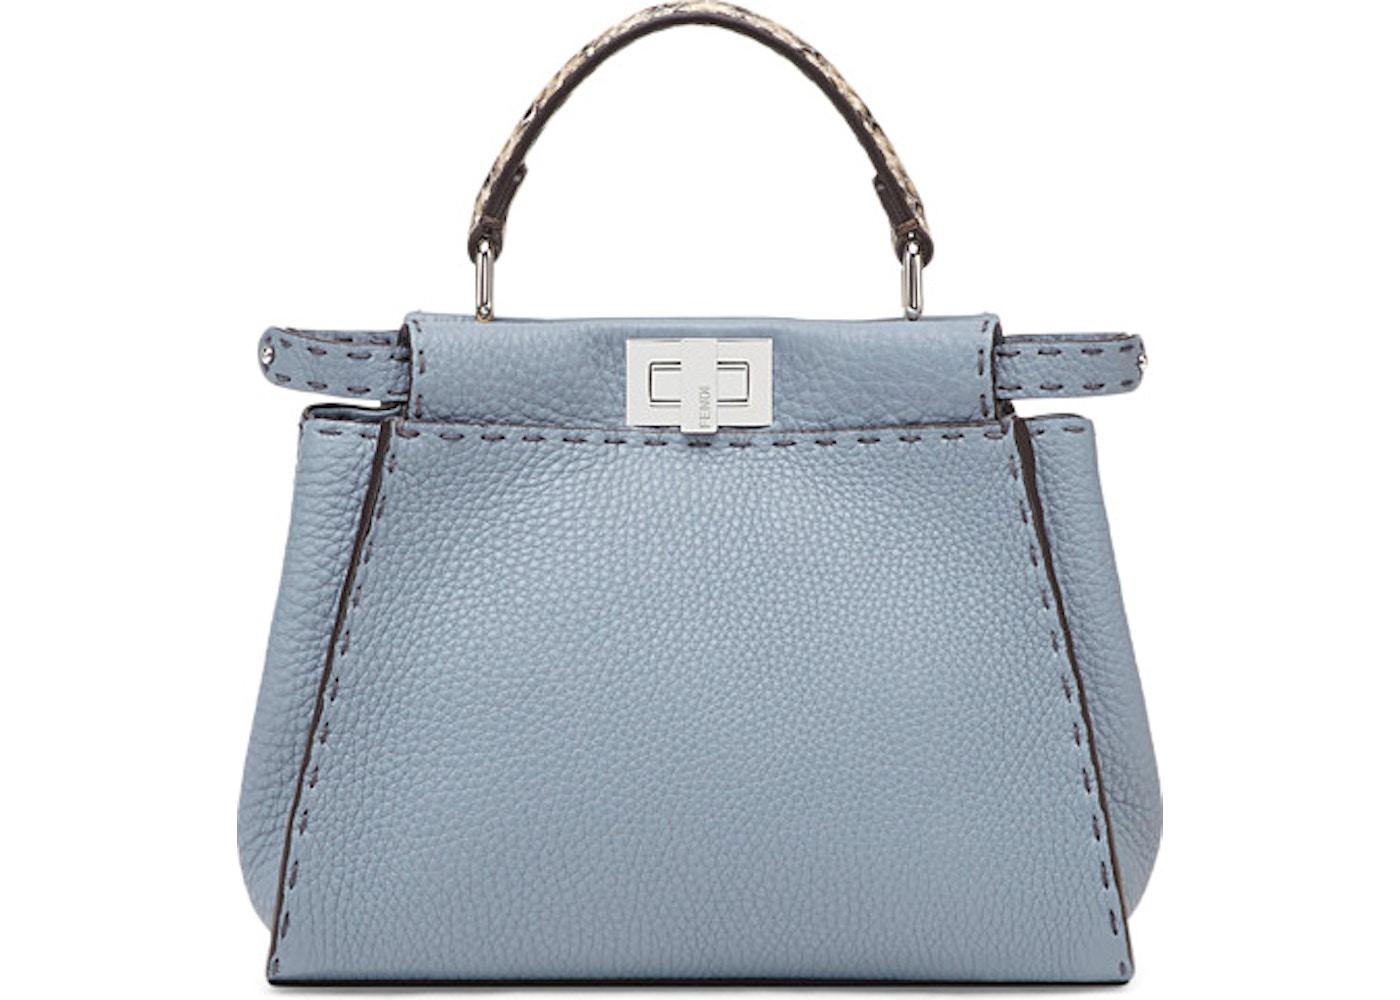 dd5521c5db4b Buy   Sell Fendi Handbags - Highest Bid